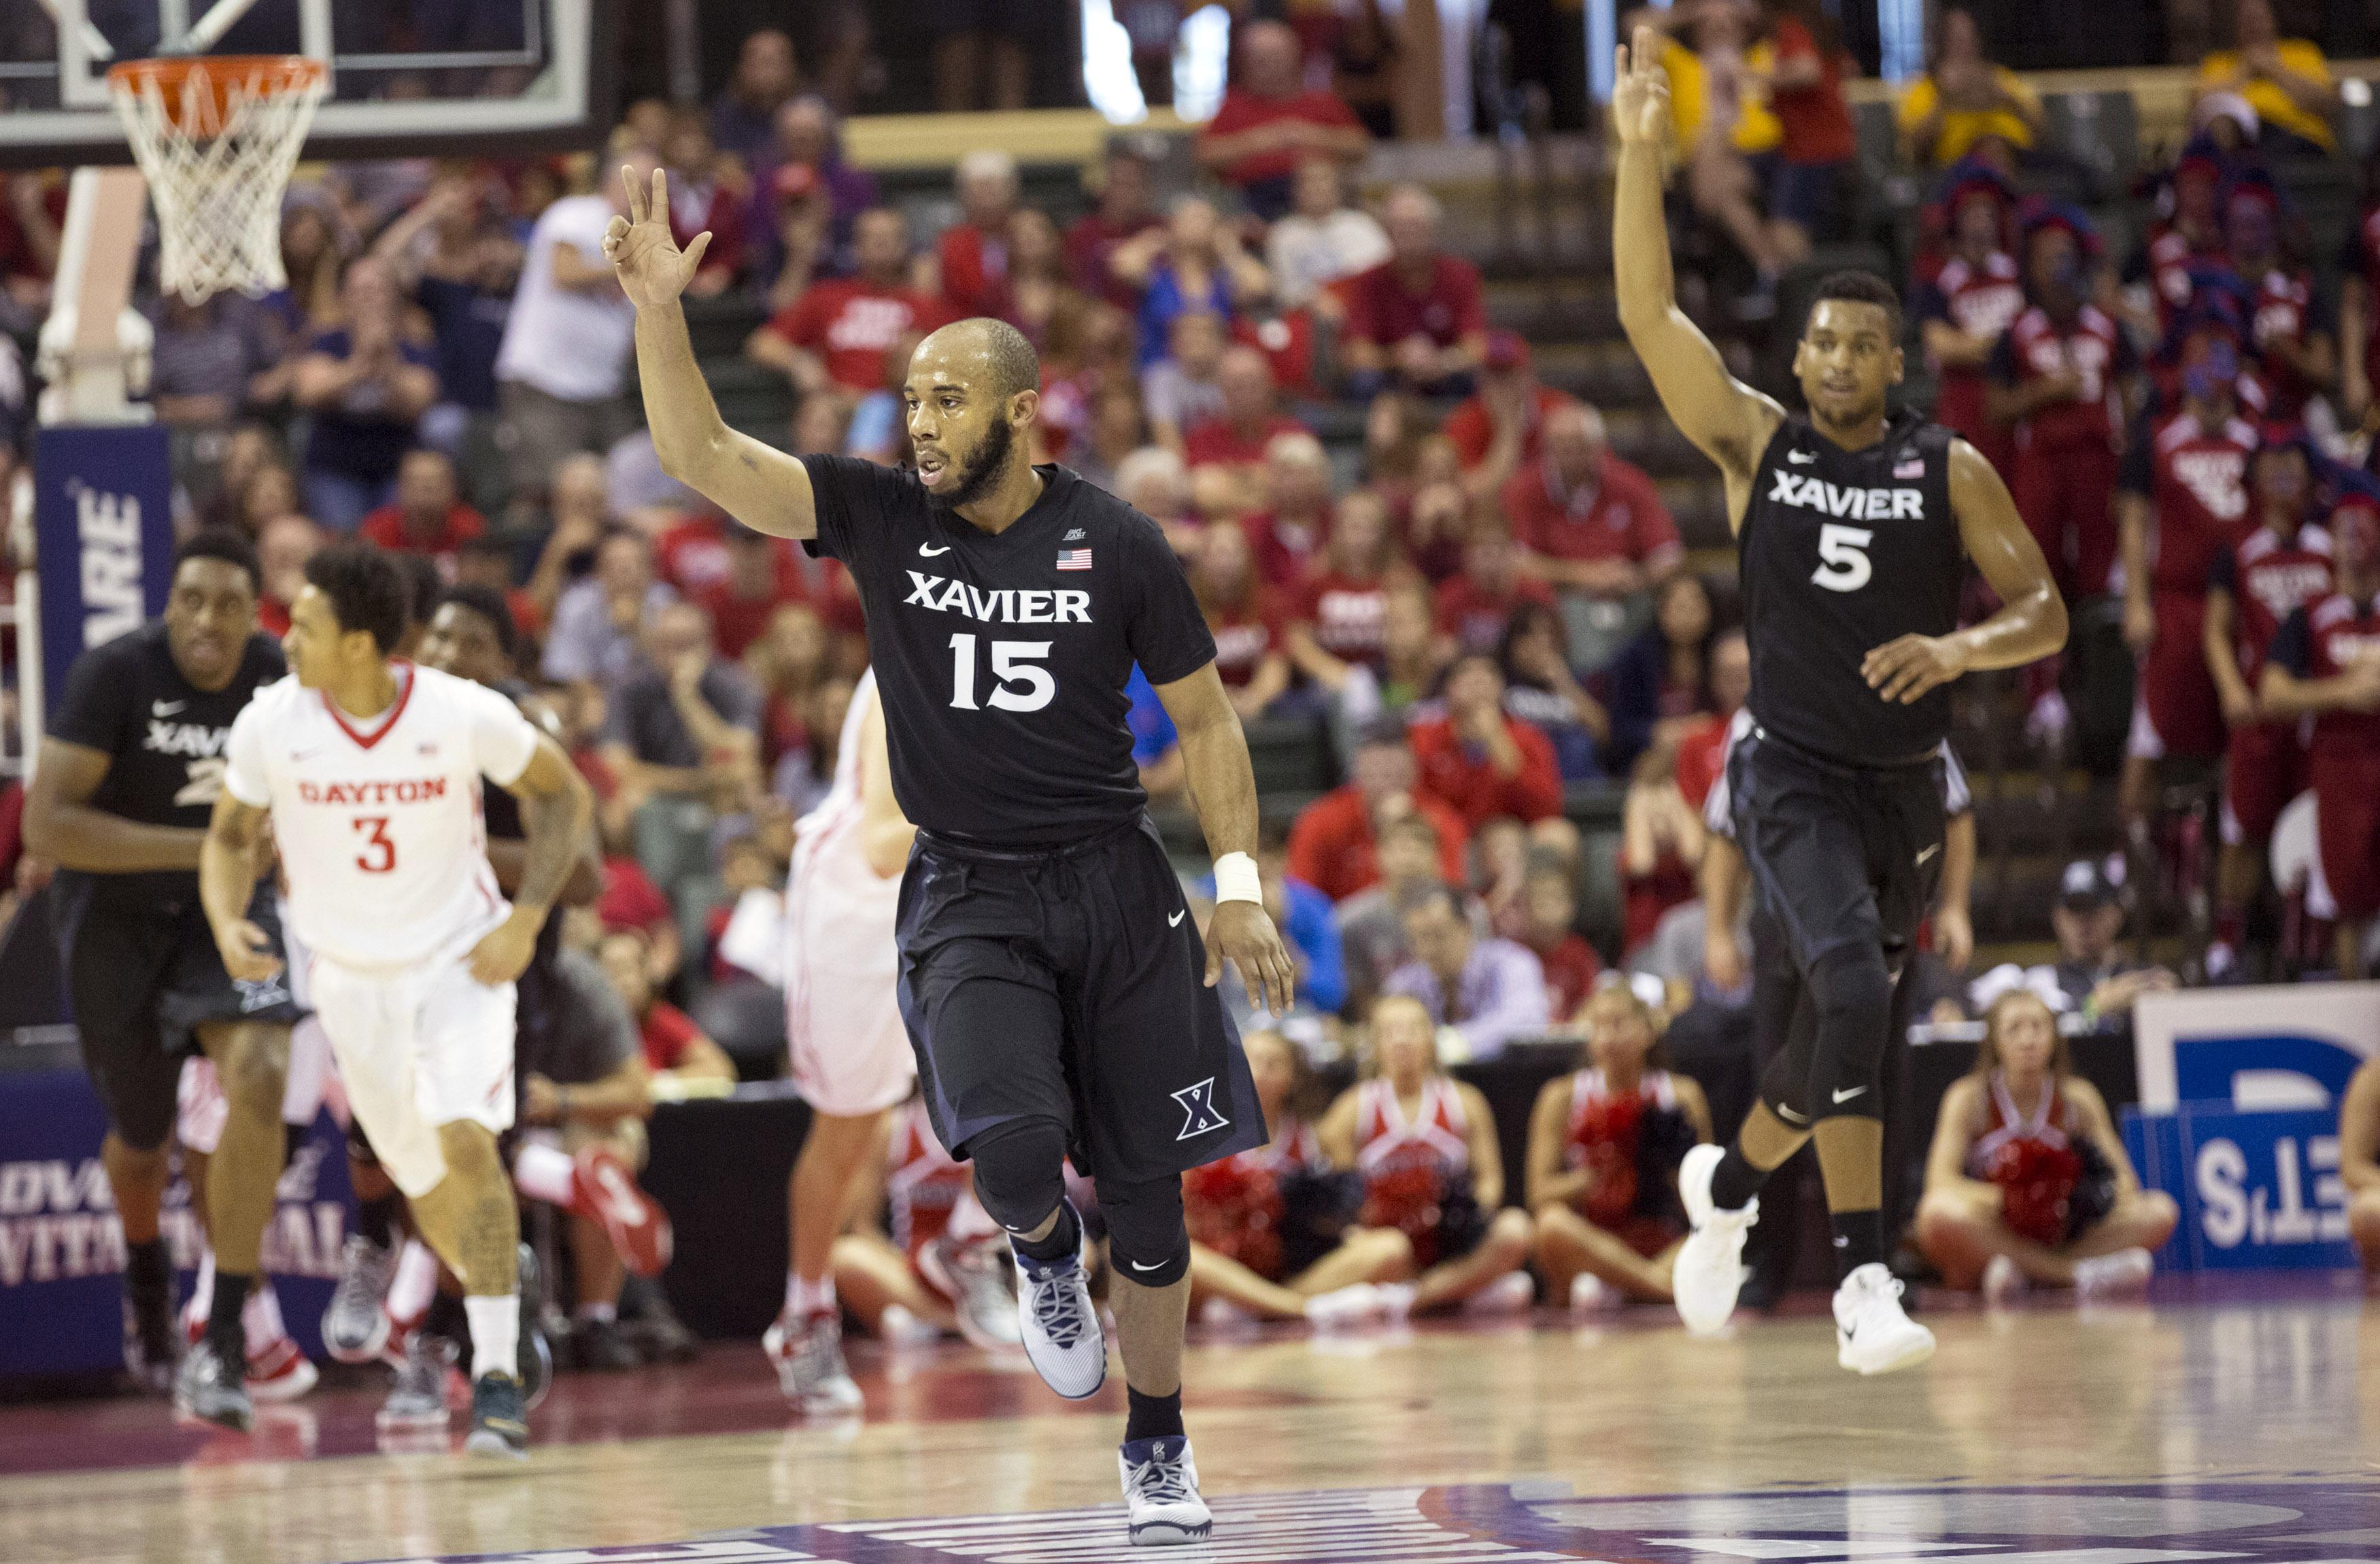 Xavier guard Myles Davis (15) signals his 3-point basket along with guard Trevon Bluiett (5) during the first half of an NCAA college basketball game against Dayton, Sunday, Nov. 29, 2015, in Orlando, Fla. (AP Photo/Willie J. Allen Jr.)